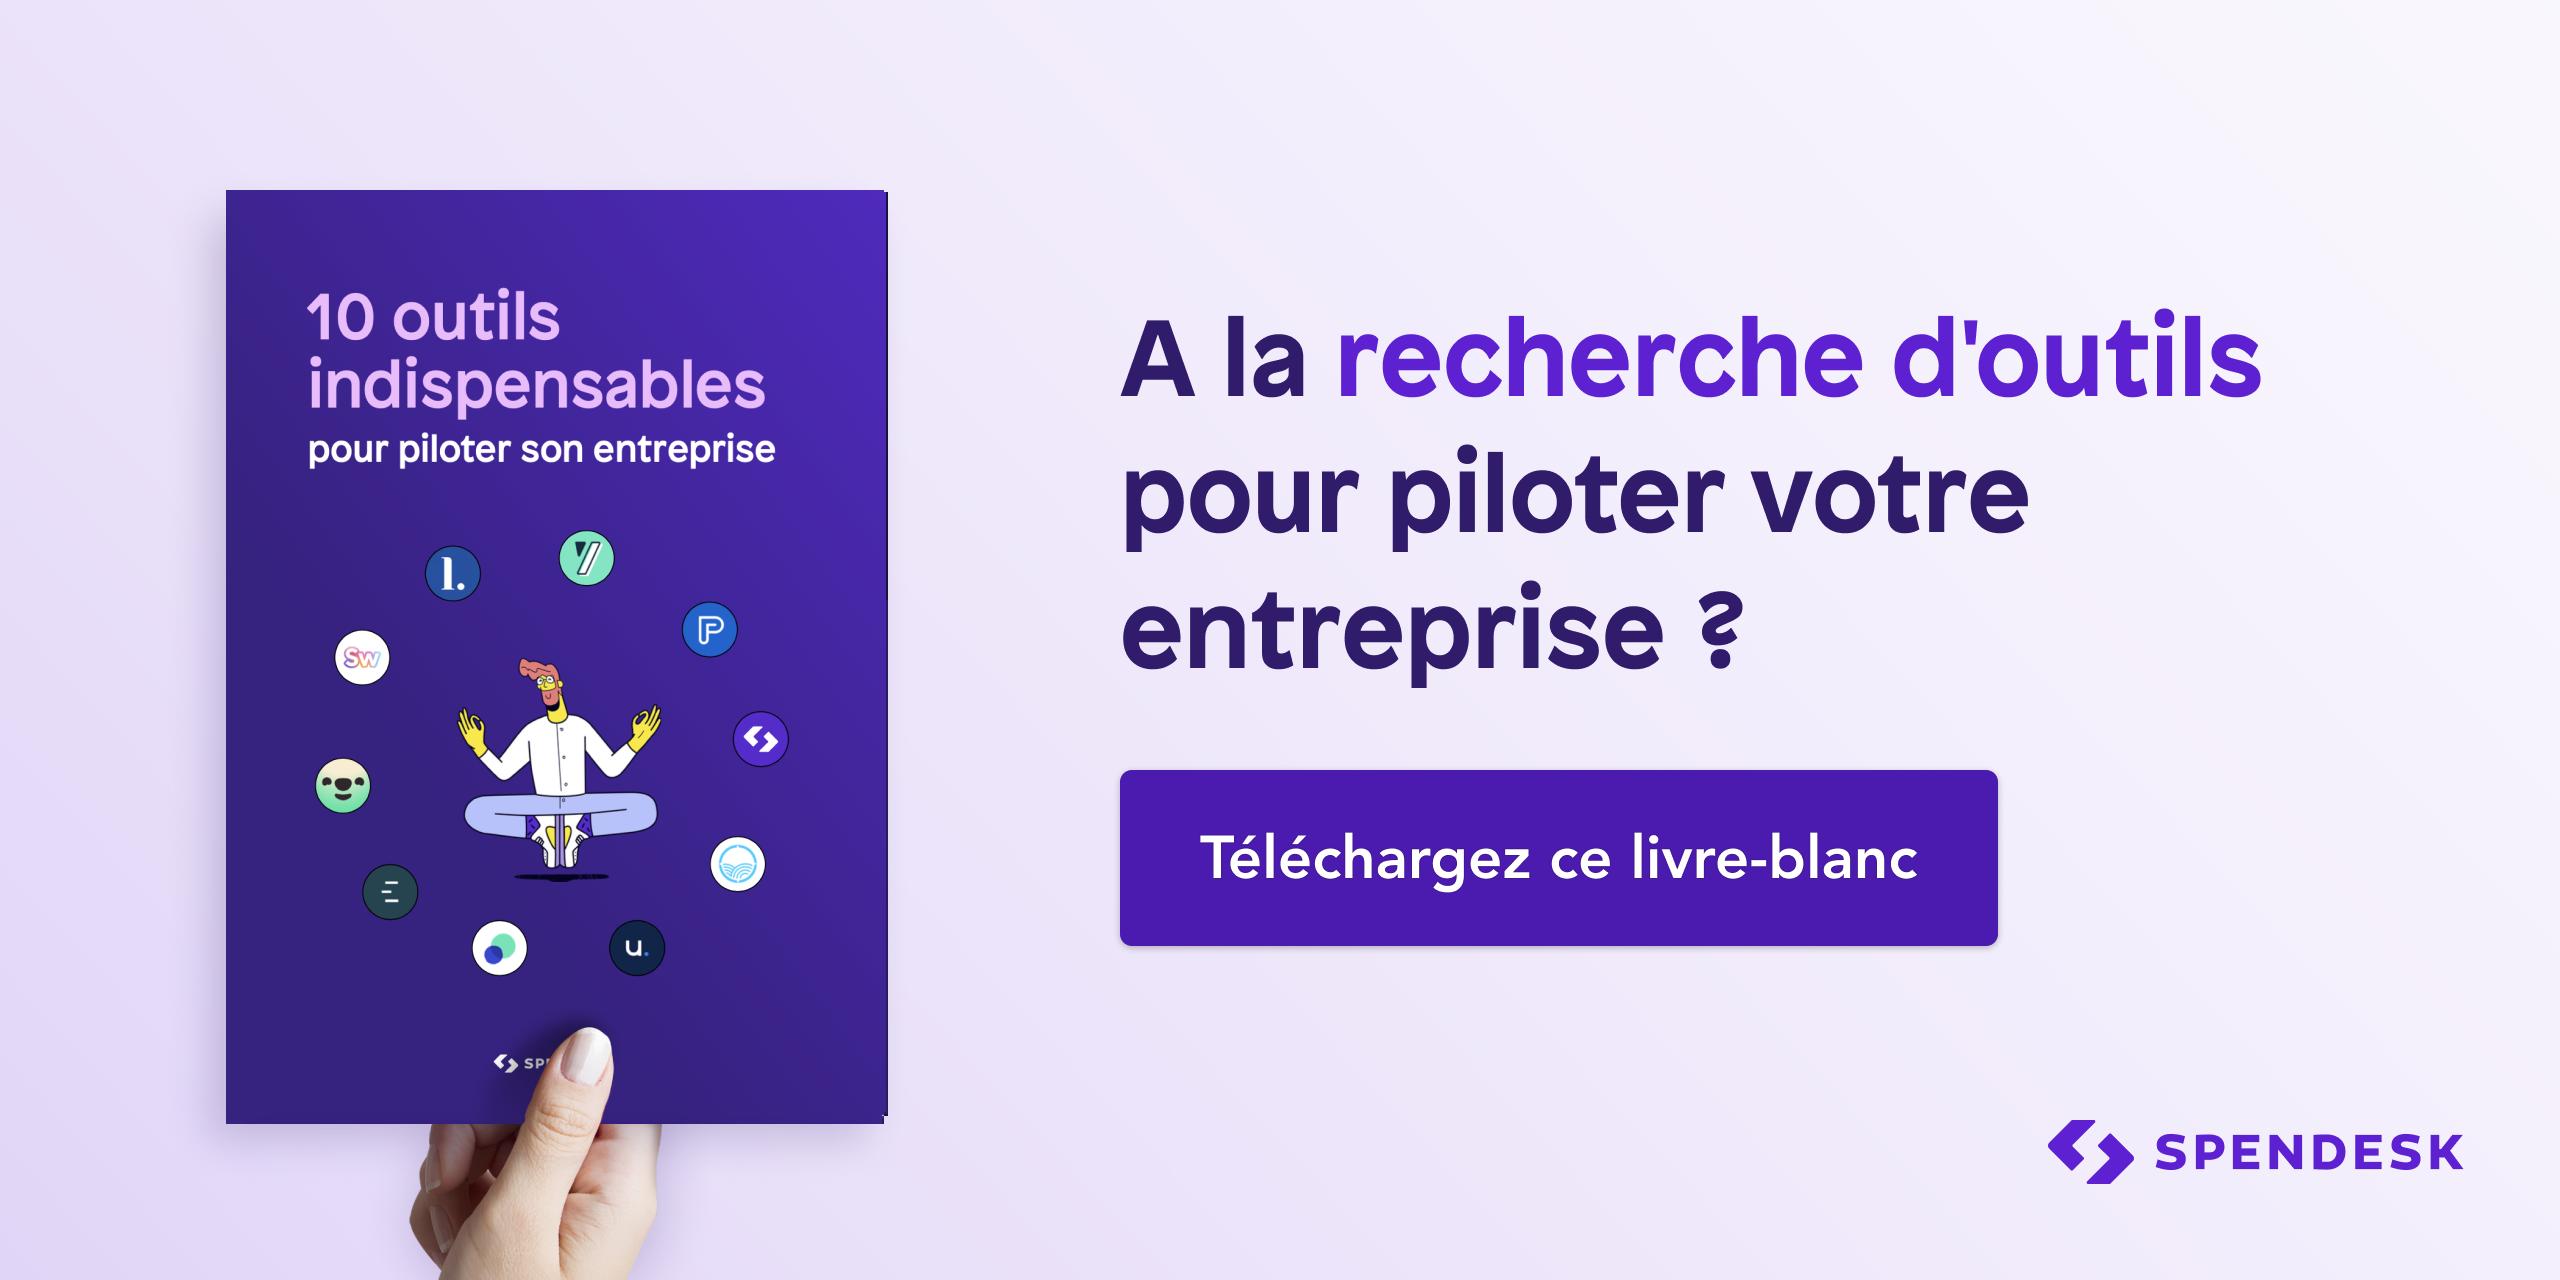 ebook - spendesk - outils - pilotage - entreprise